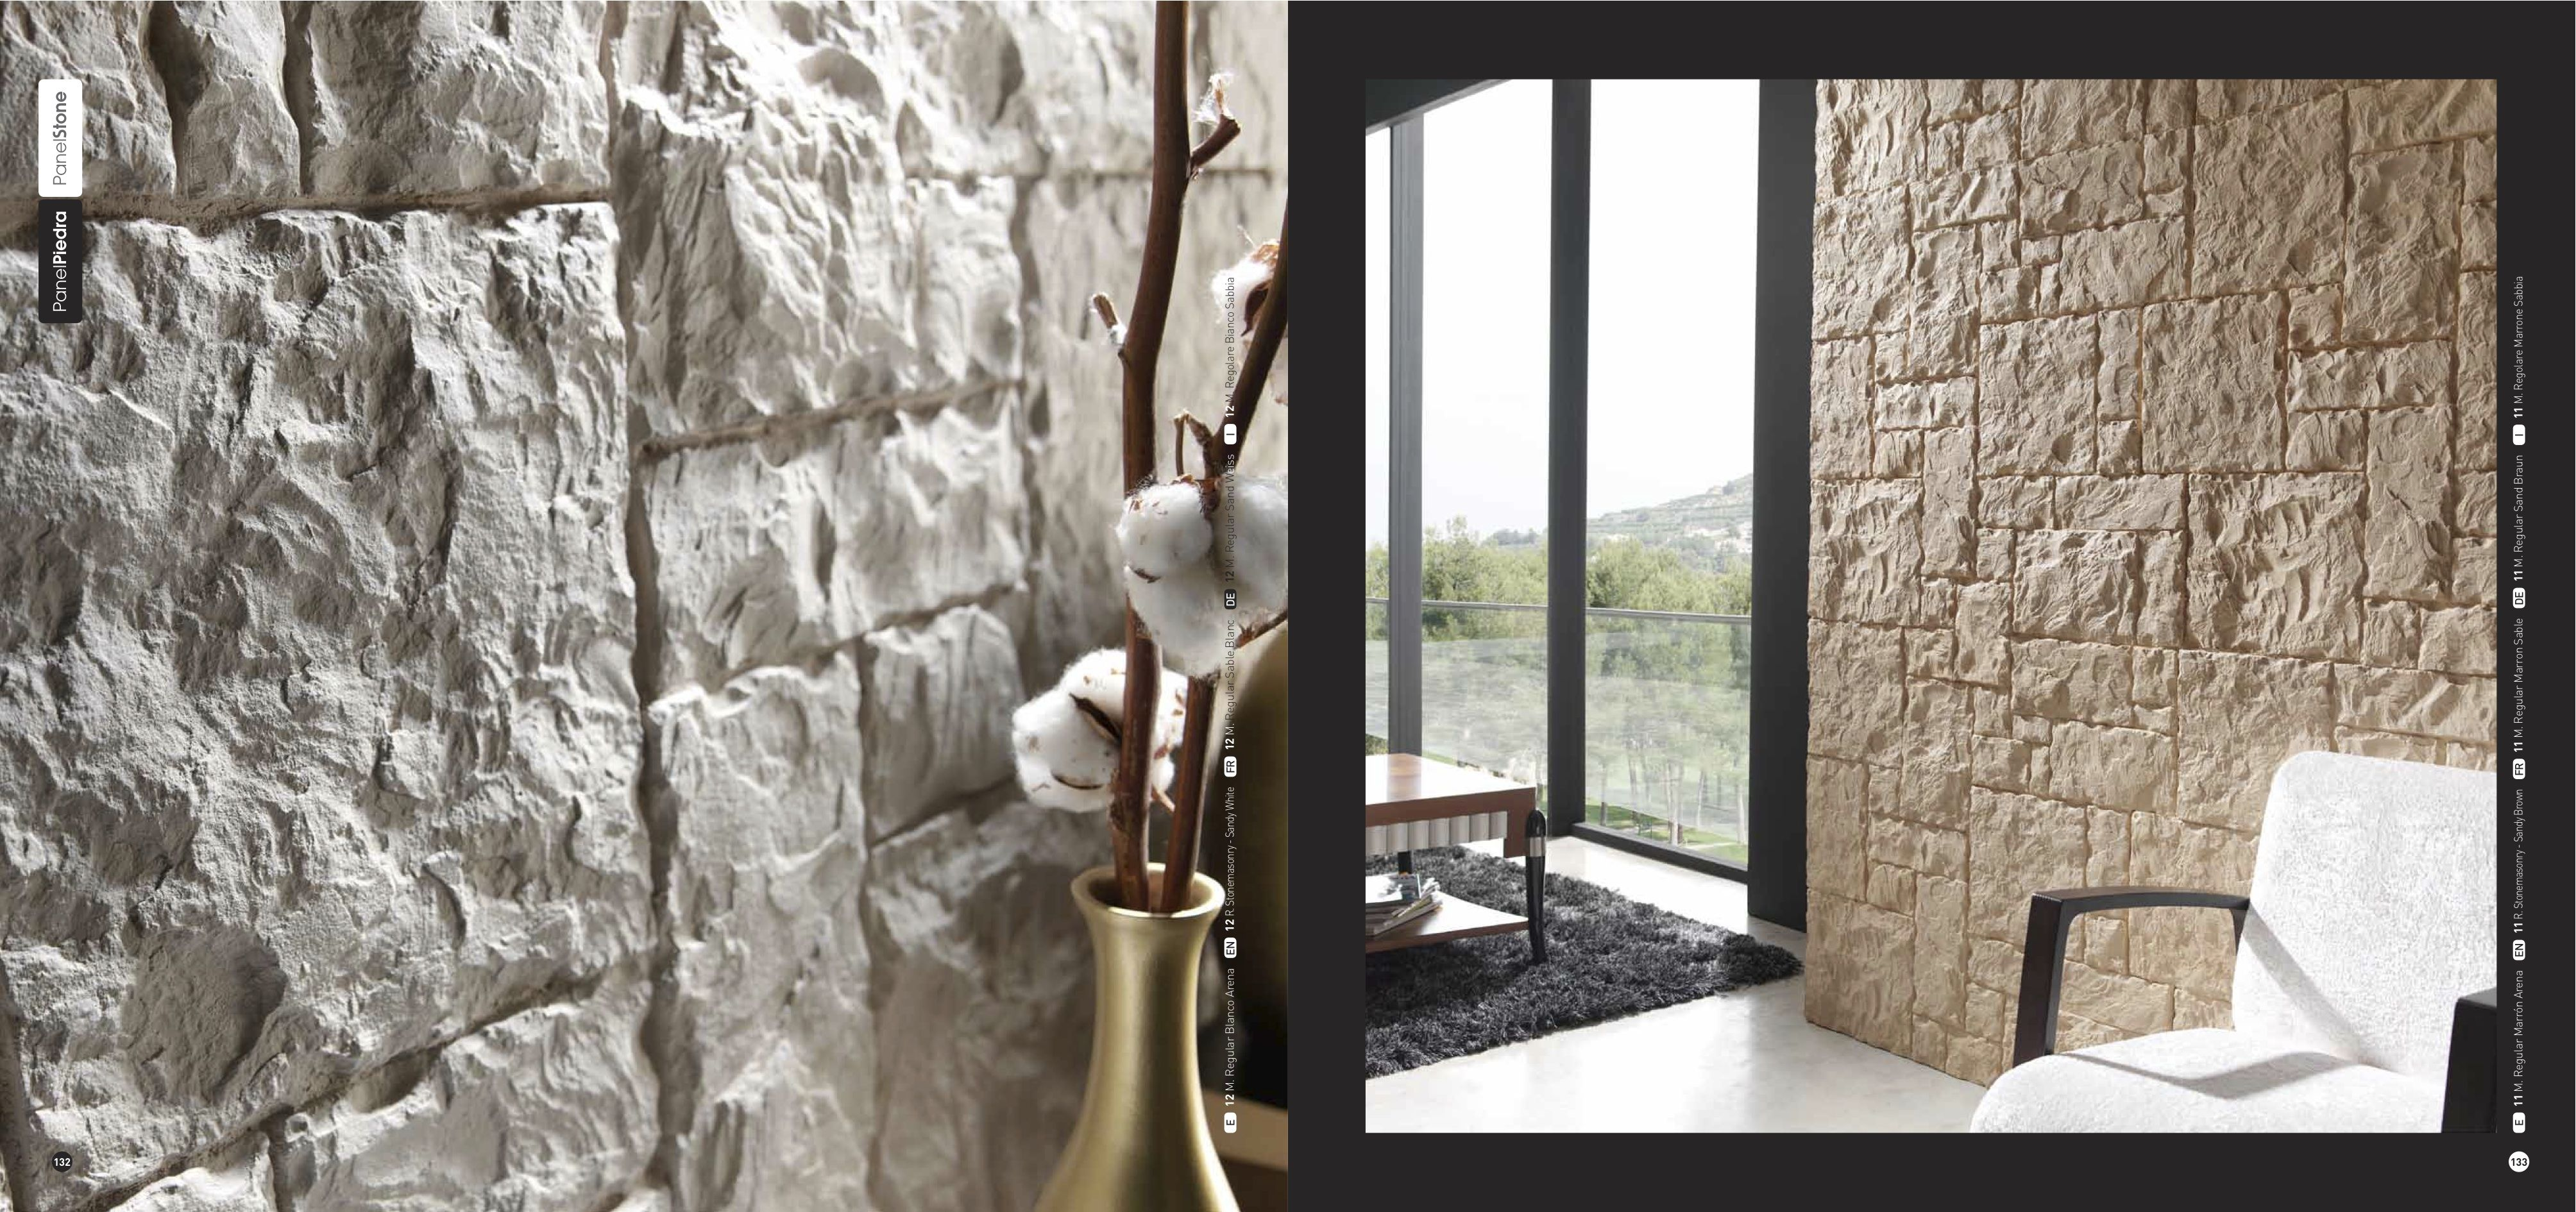 Dreamwall: Classic Collection http://wp.me/pGOHK-q0 Mamposteria Regular Stone Panels #stone #walls #surfaces #interiors #interiordesign